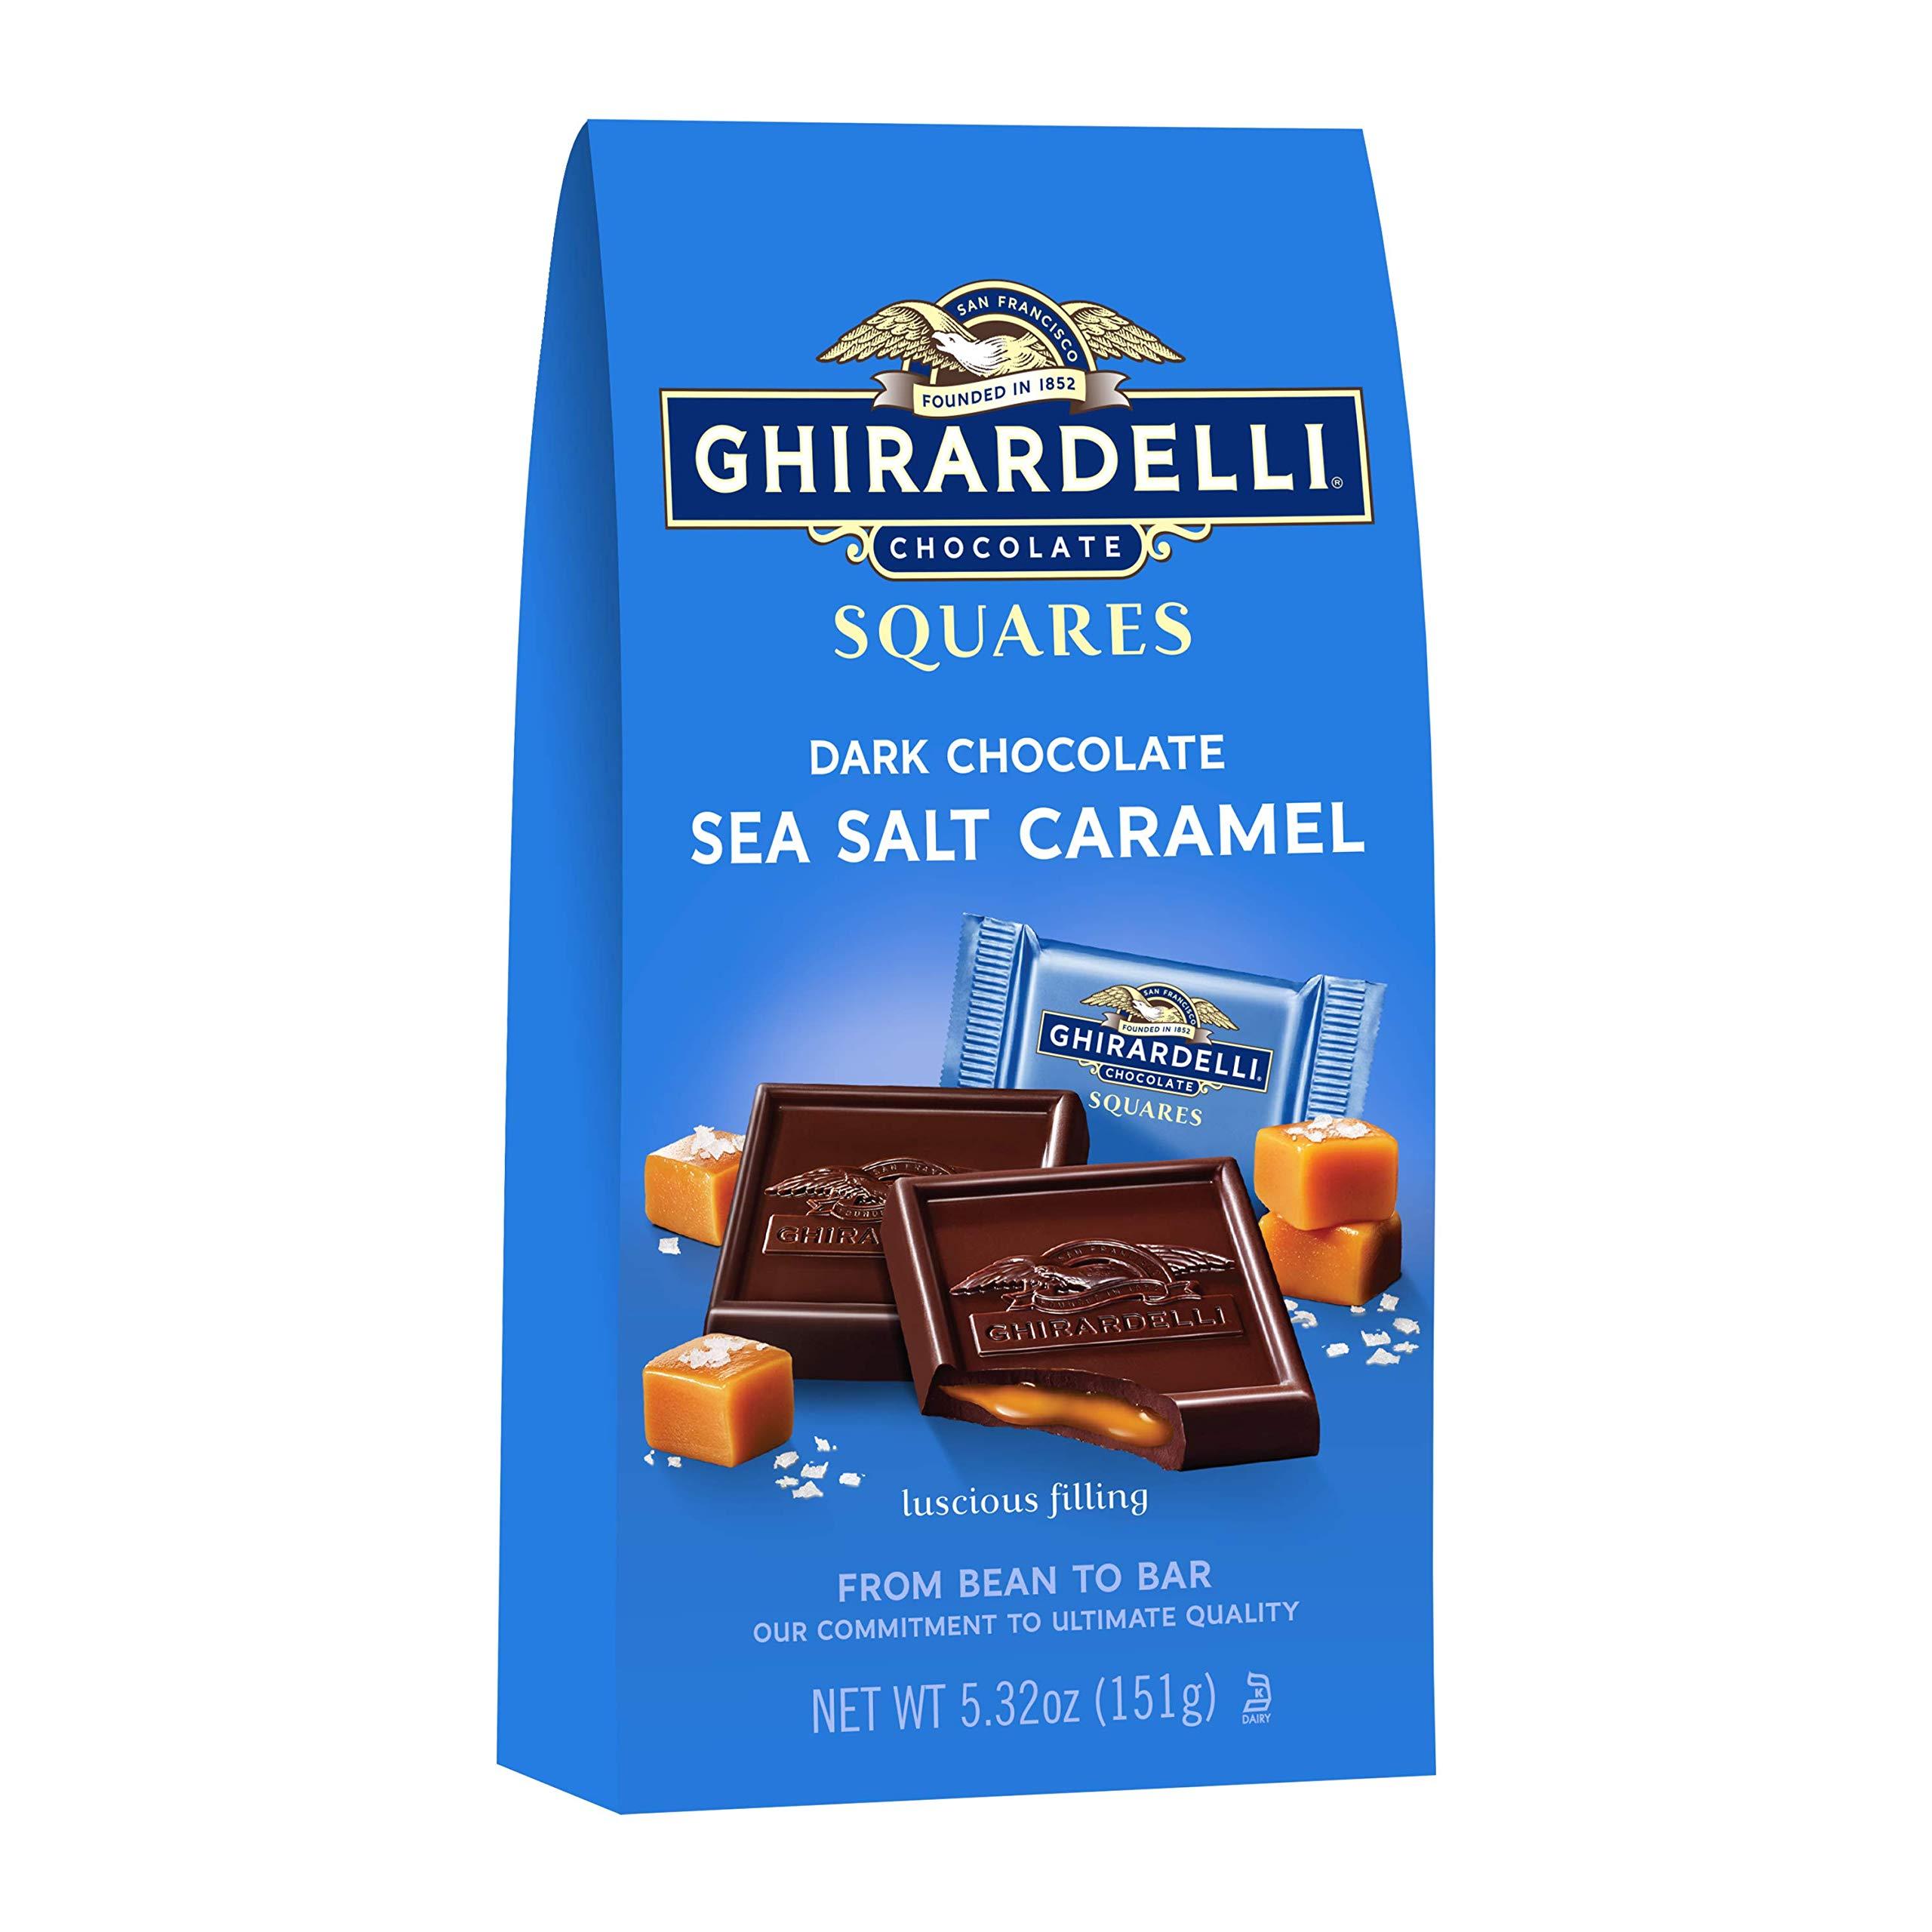 Ghirardelli Dark and Caramel Sea Salt Chocolate Squares Bag, 5.32-Ounce